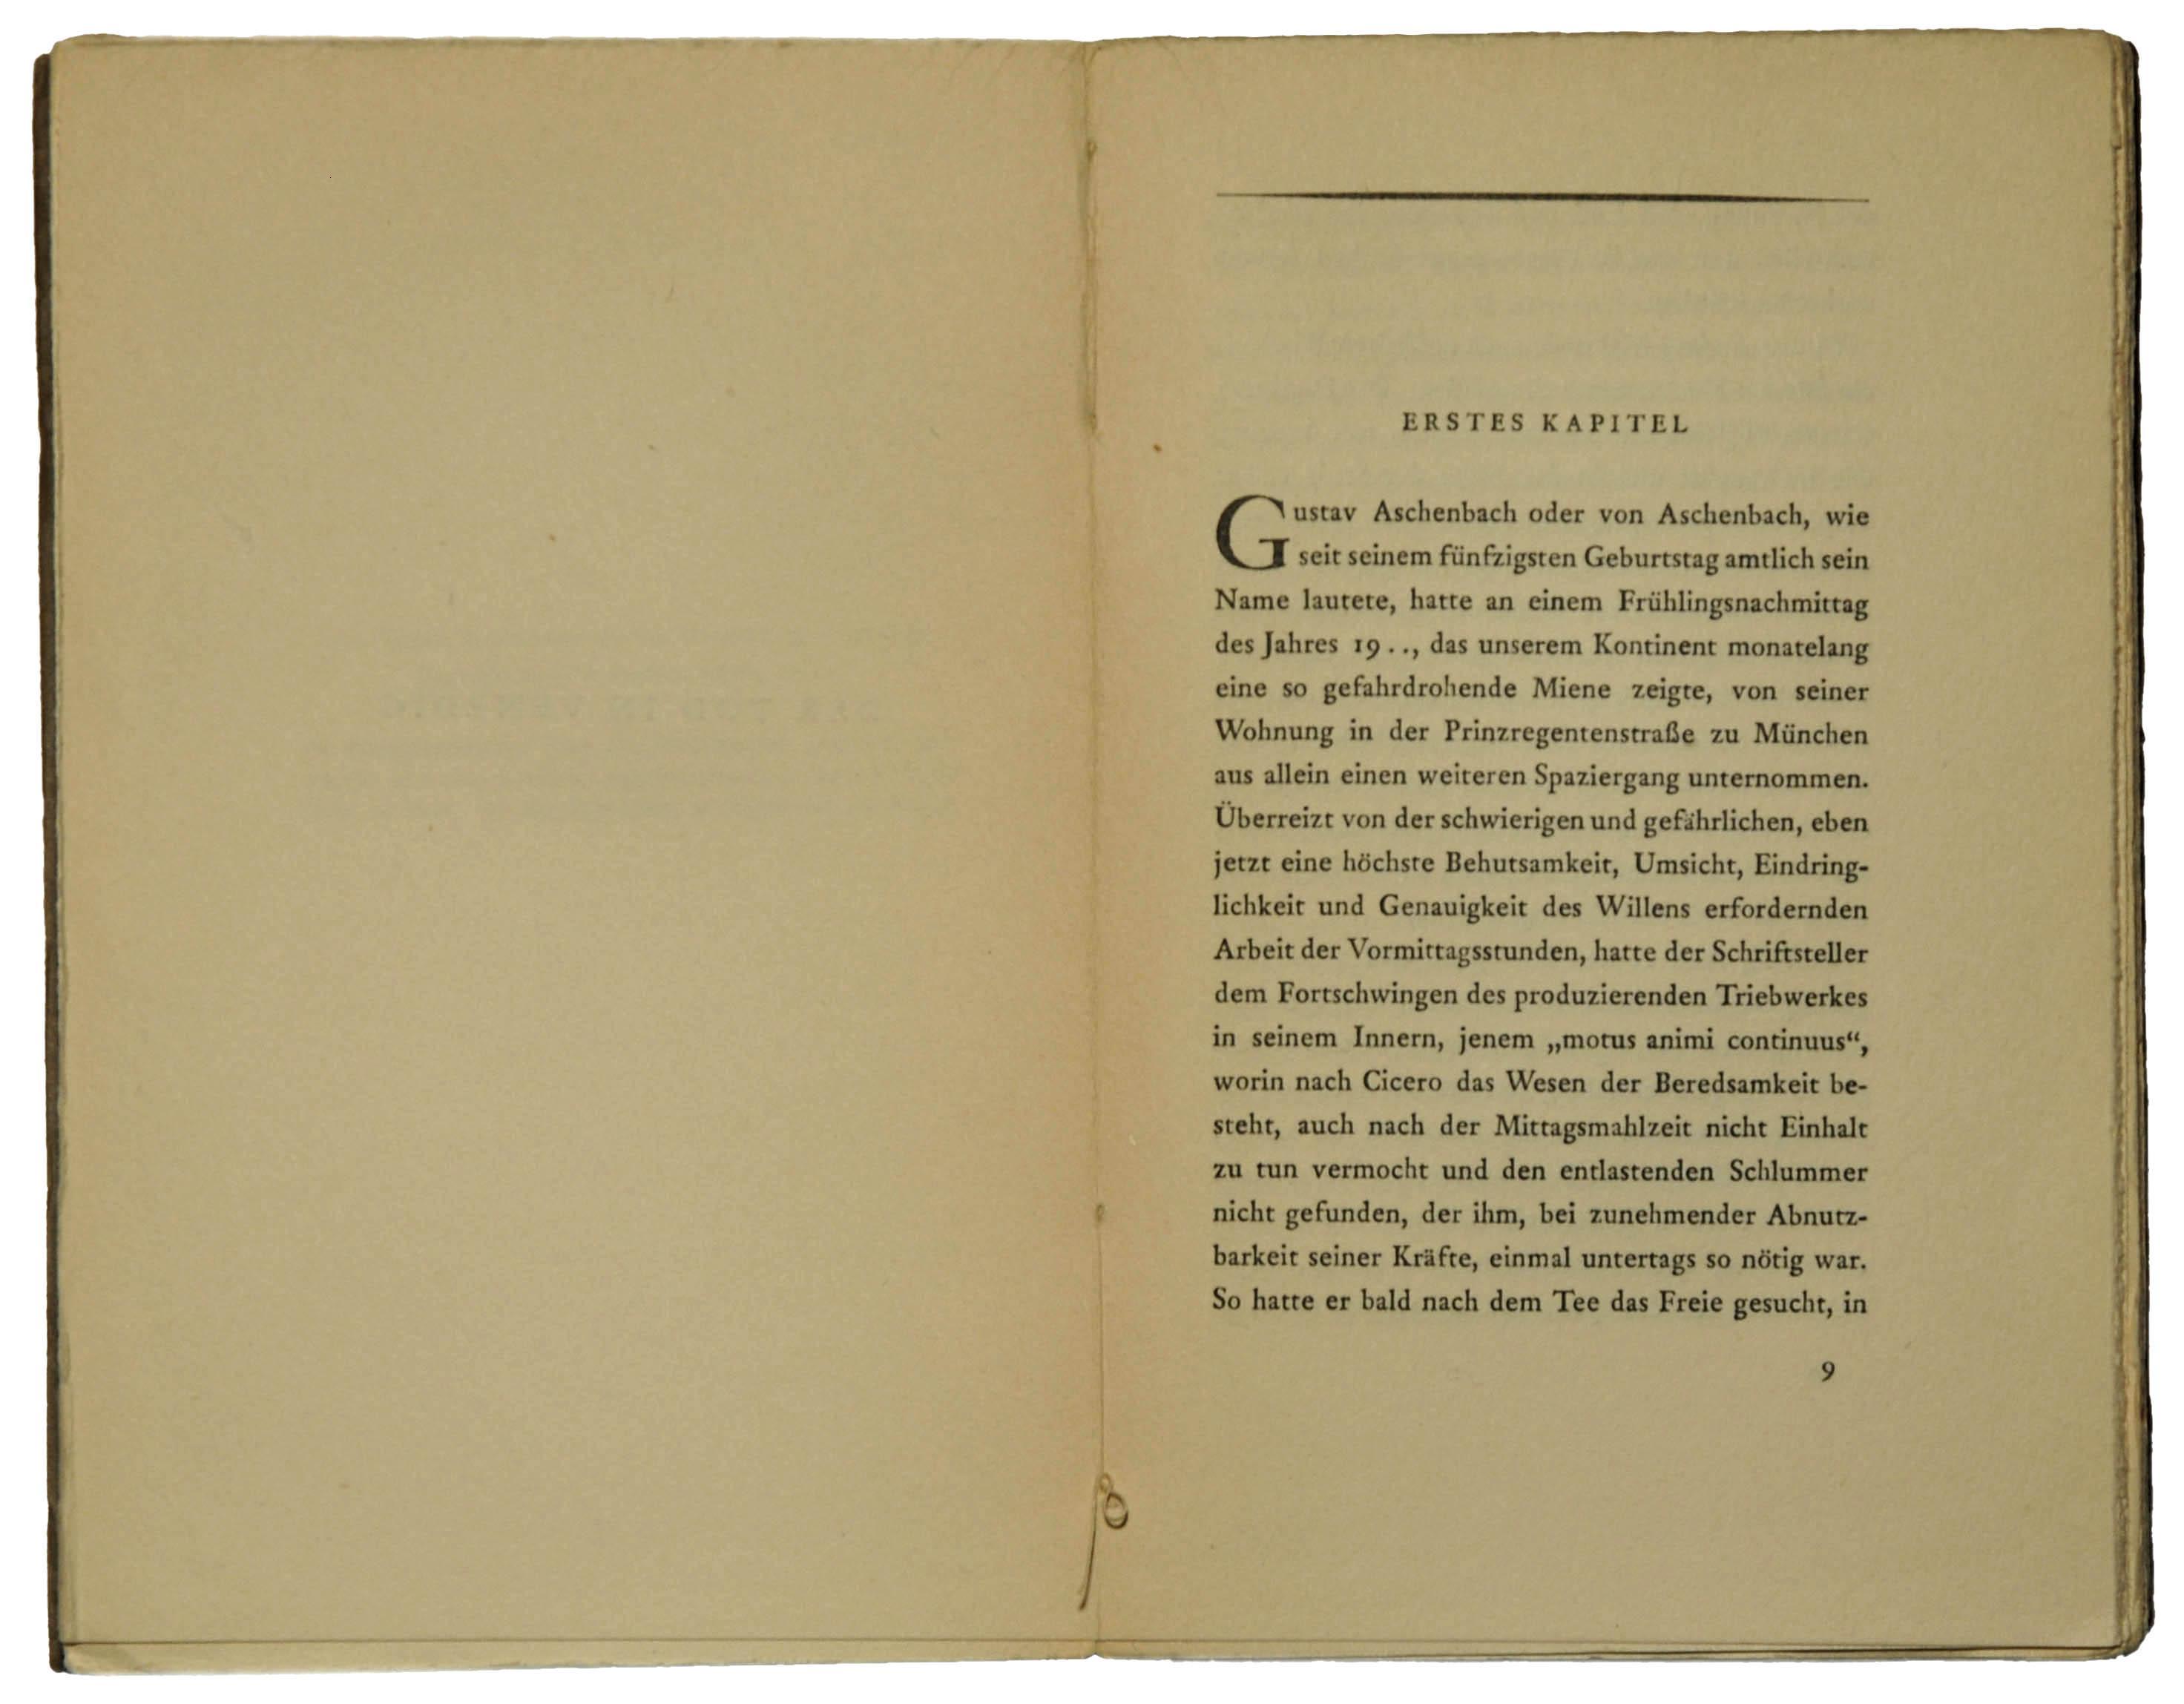 File:Fonatane, Th. (1889) Foto H.-P.Haack.jpg - Wikimedia